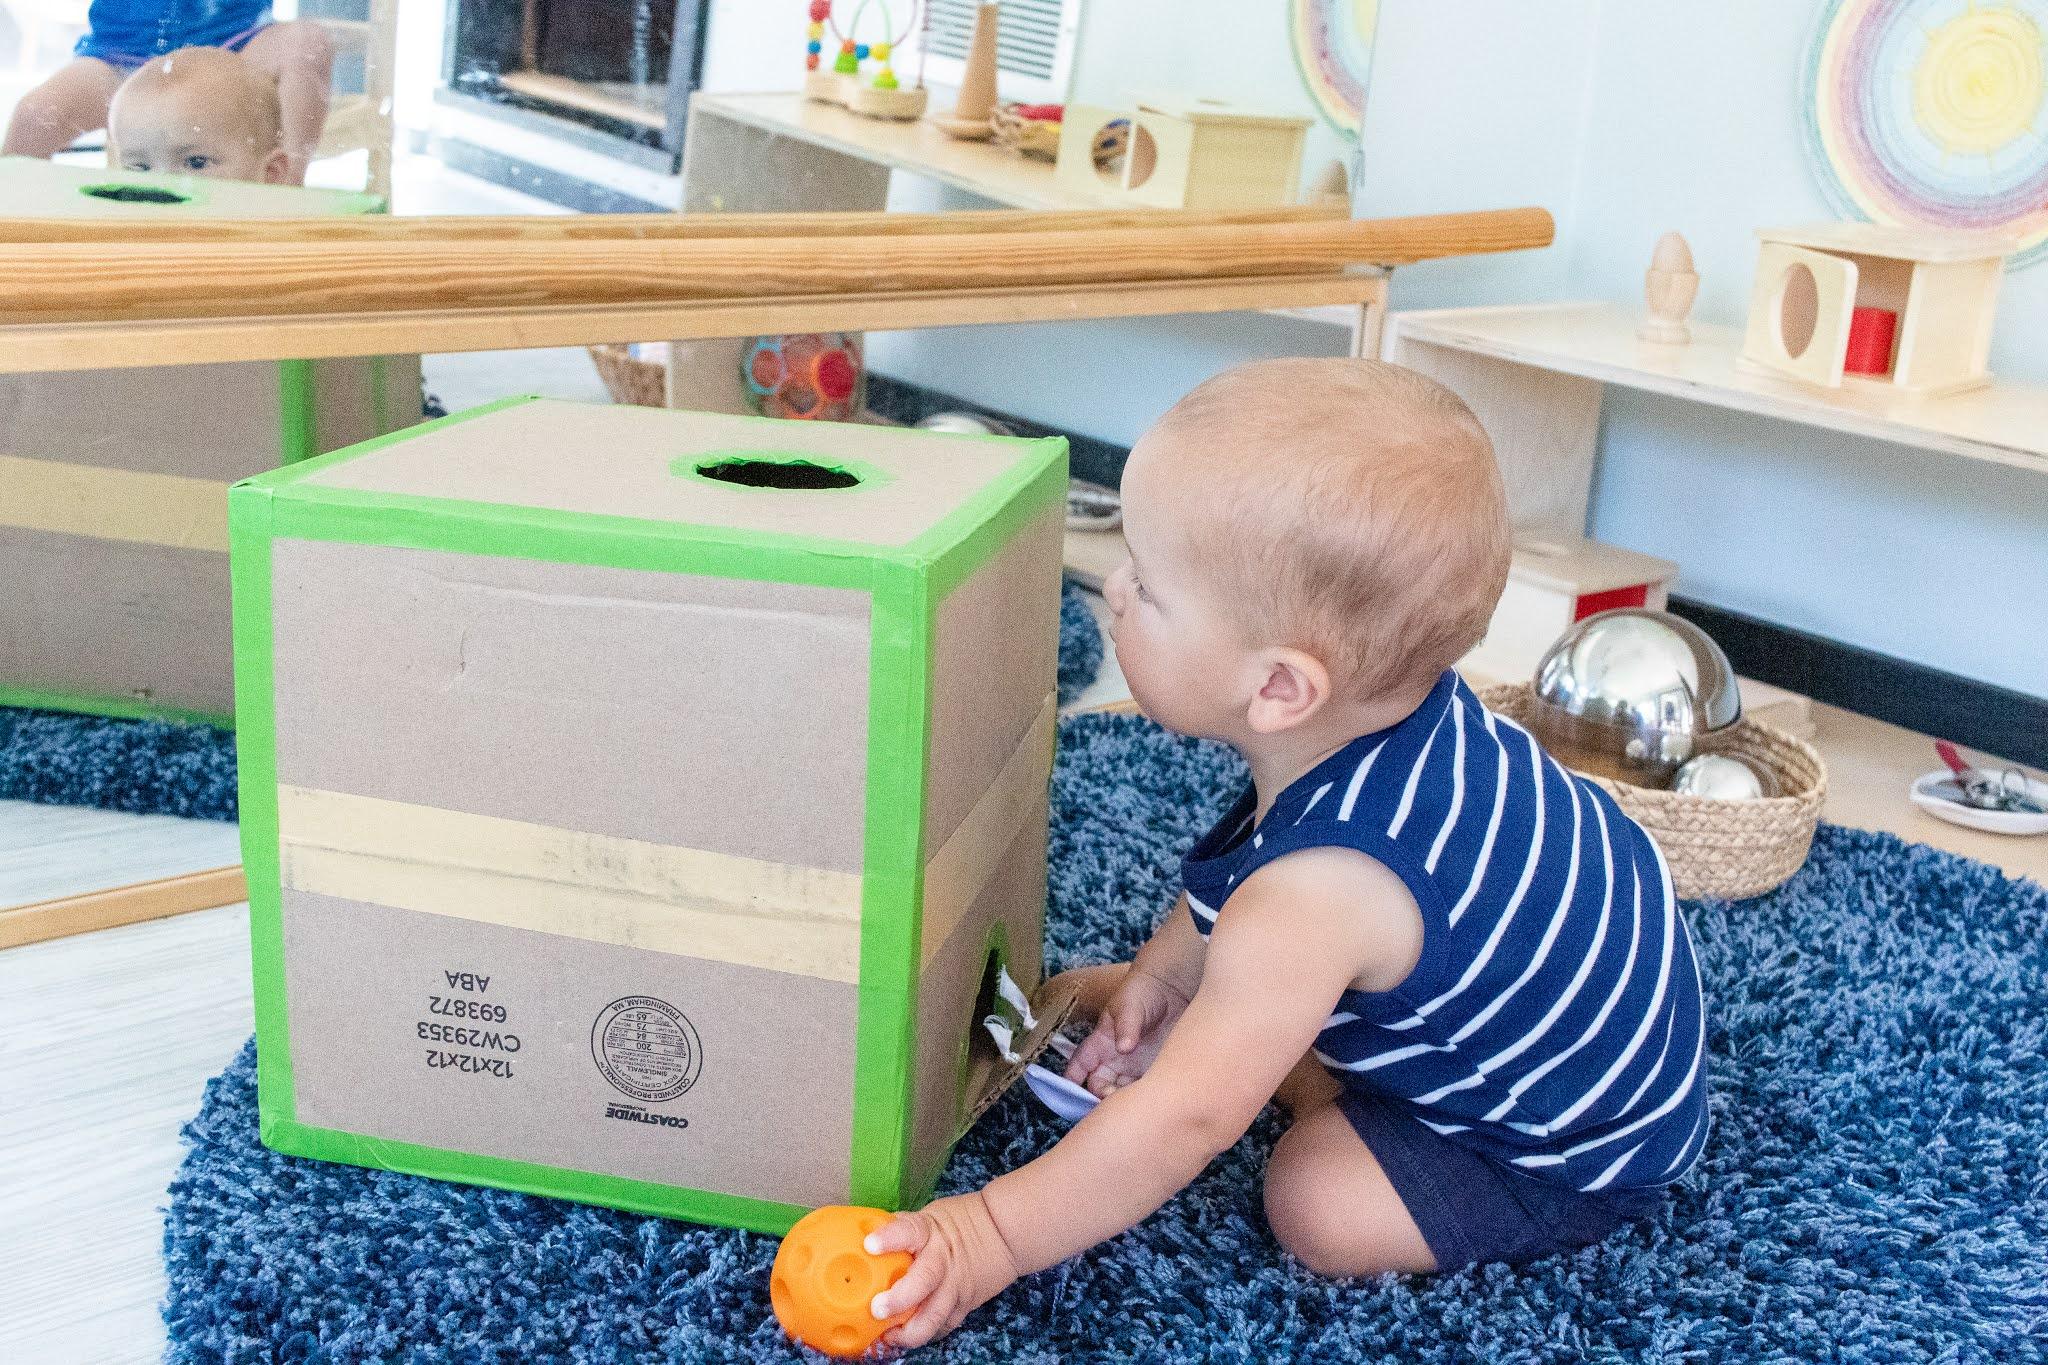 Object Permanence Box Montessori Family Educational Training Material DIY